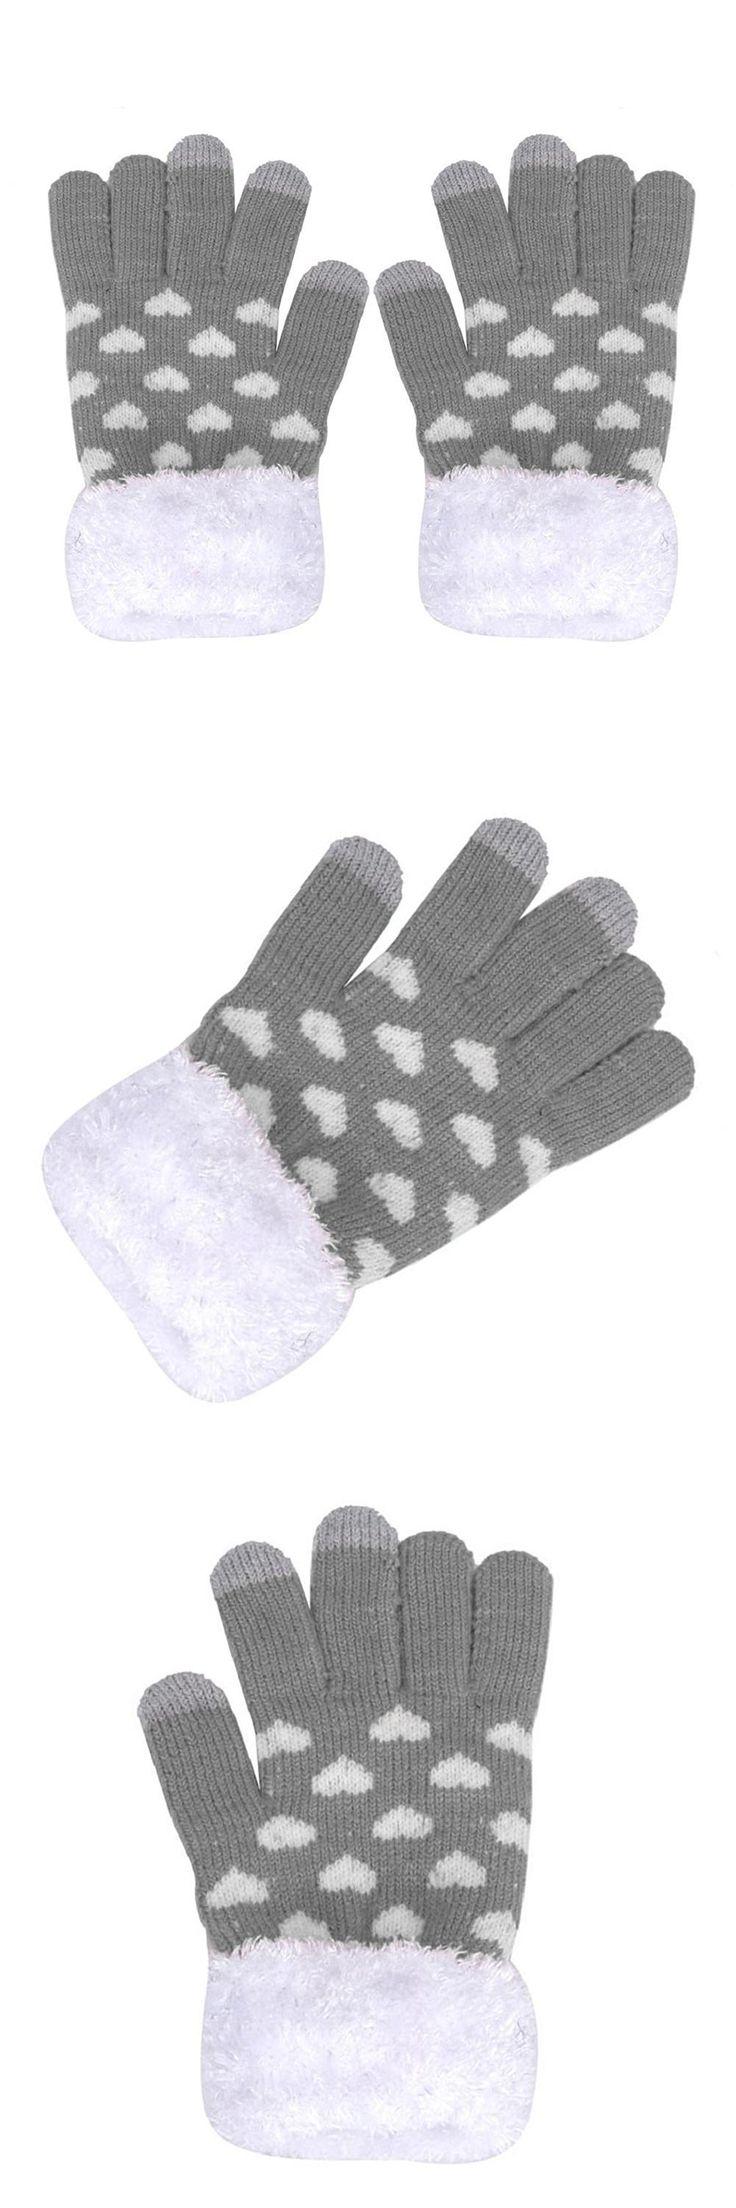 Womens Warm Winter Gloves Touch GlovesTouchscreen Gloves - gray